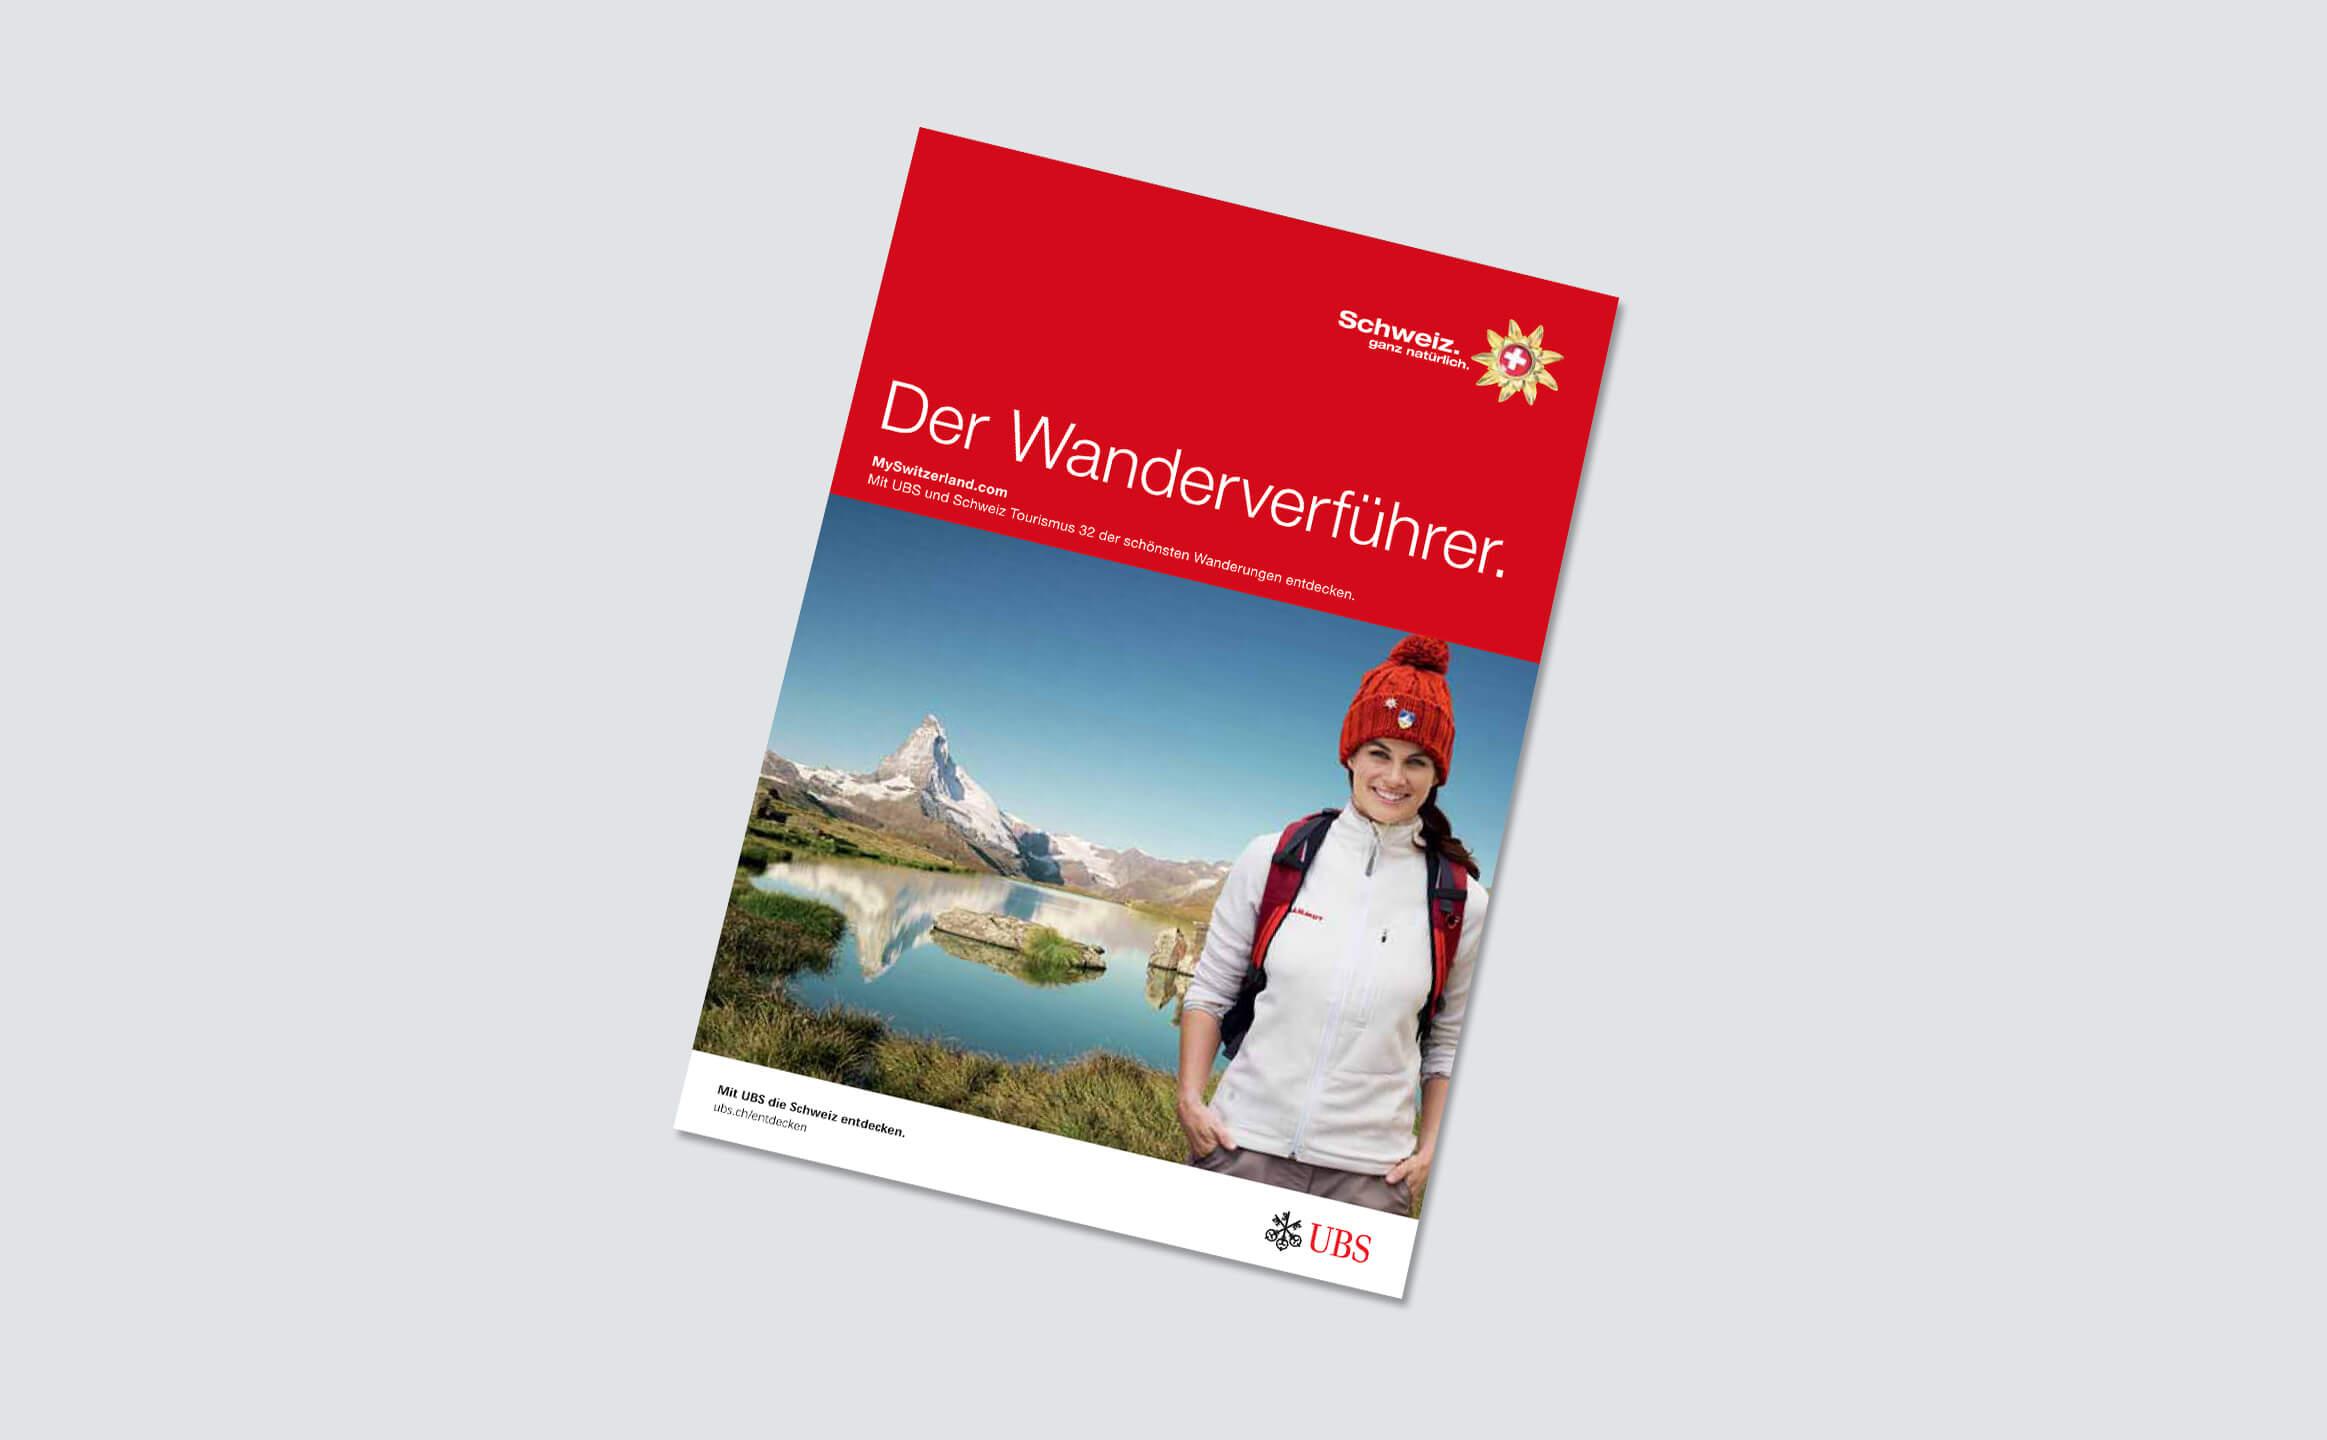 Schweiz Tourismus Marc Alexander Stocker